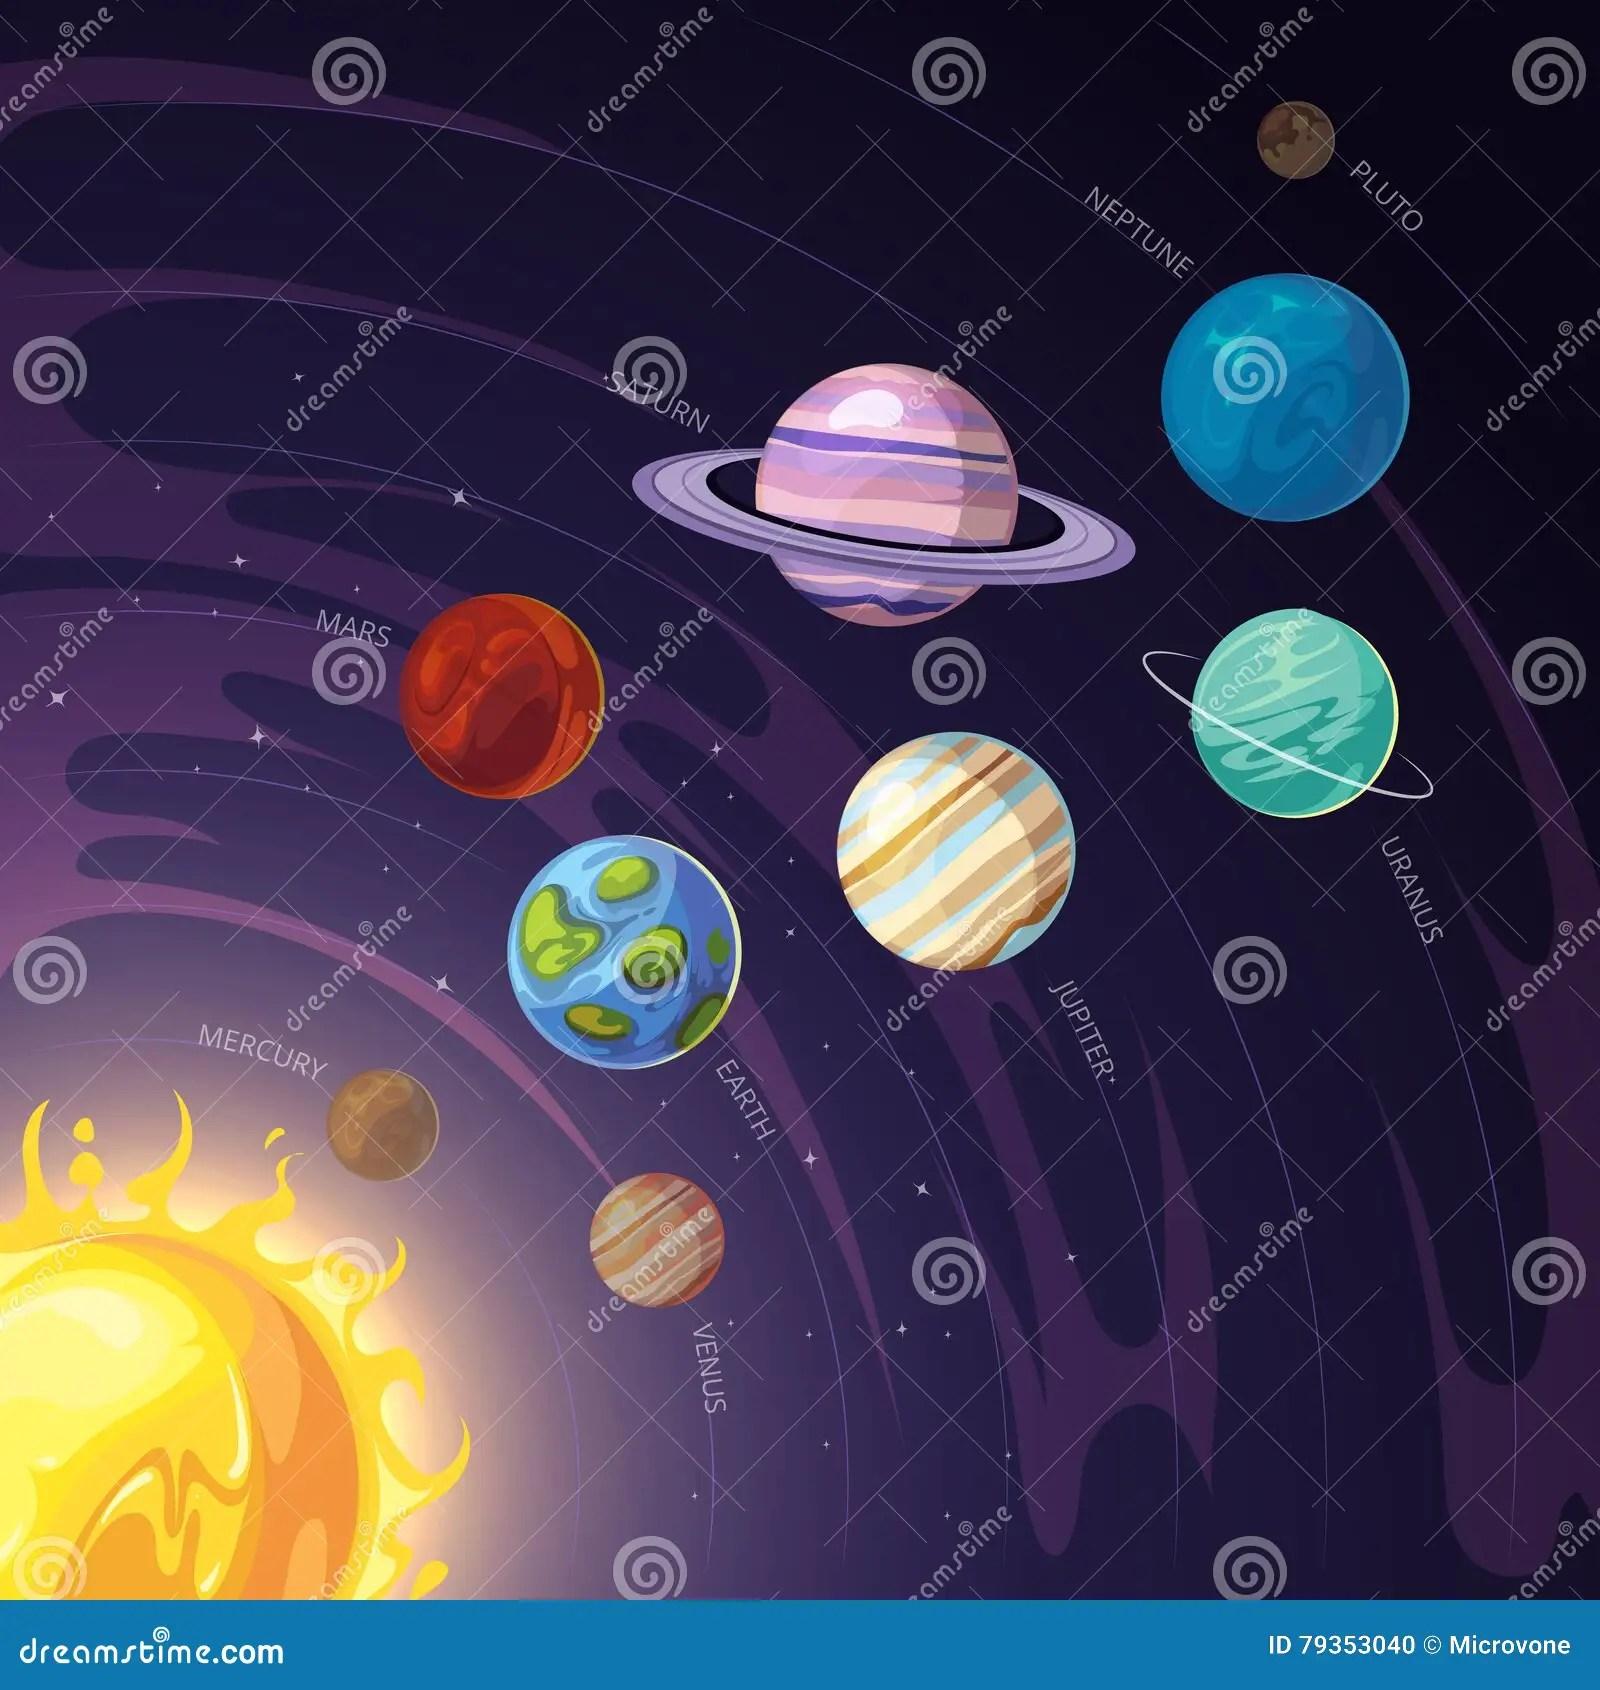 Vector Solar System With Mercury Venus Earth Mars